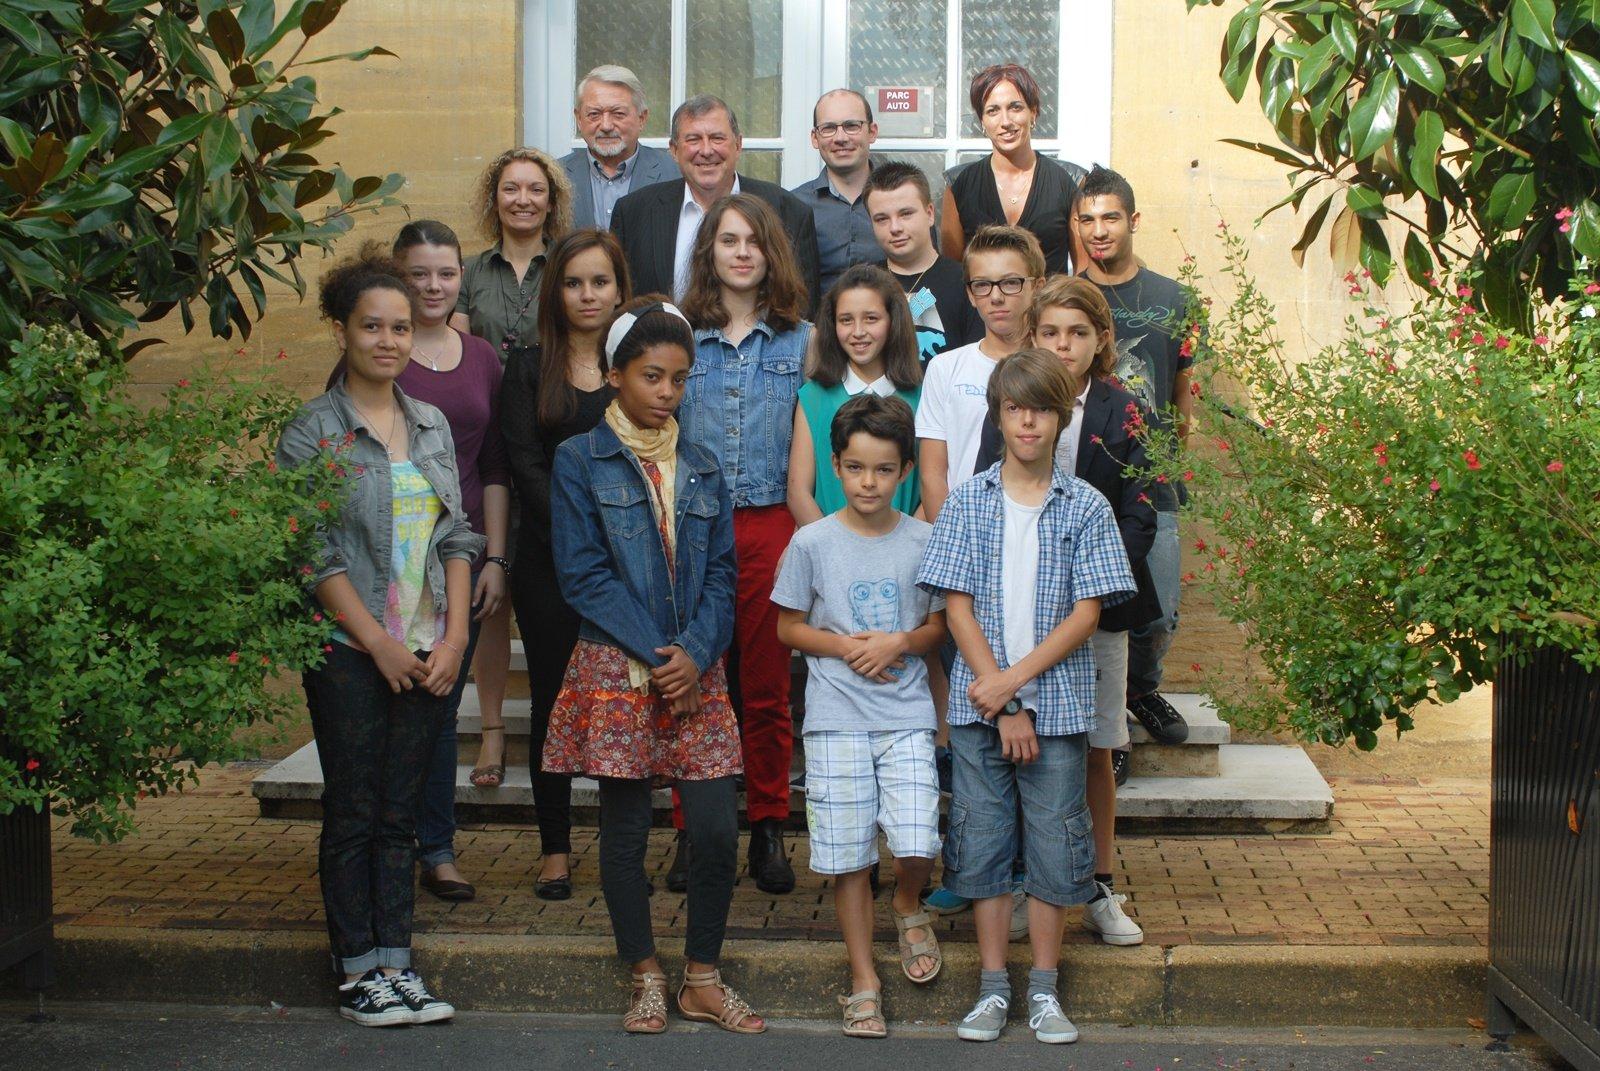 Conseil municipal de jeunes - Bergerac piscine municipale ...